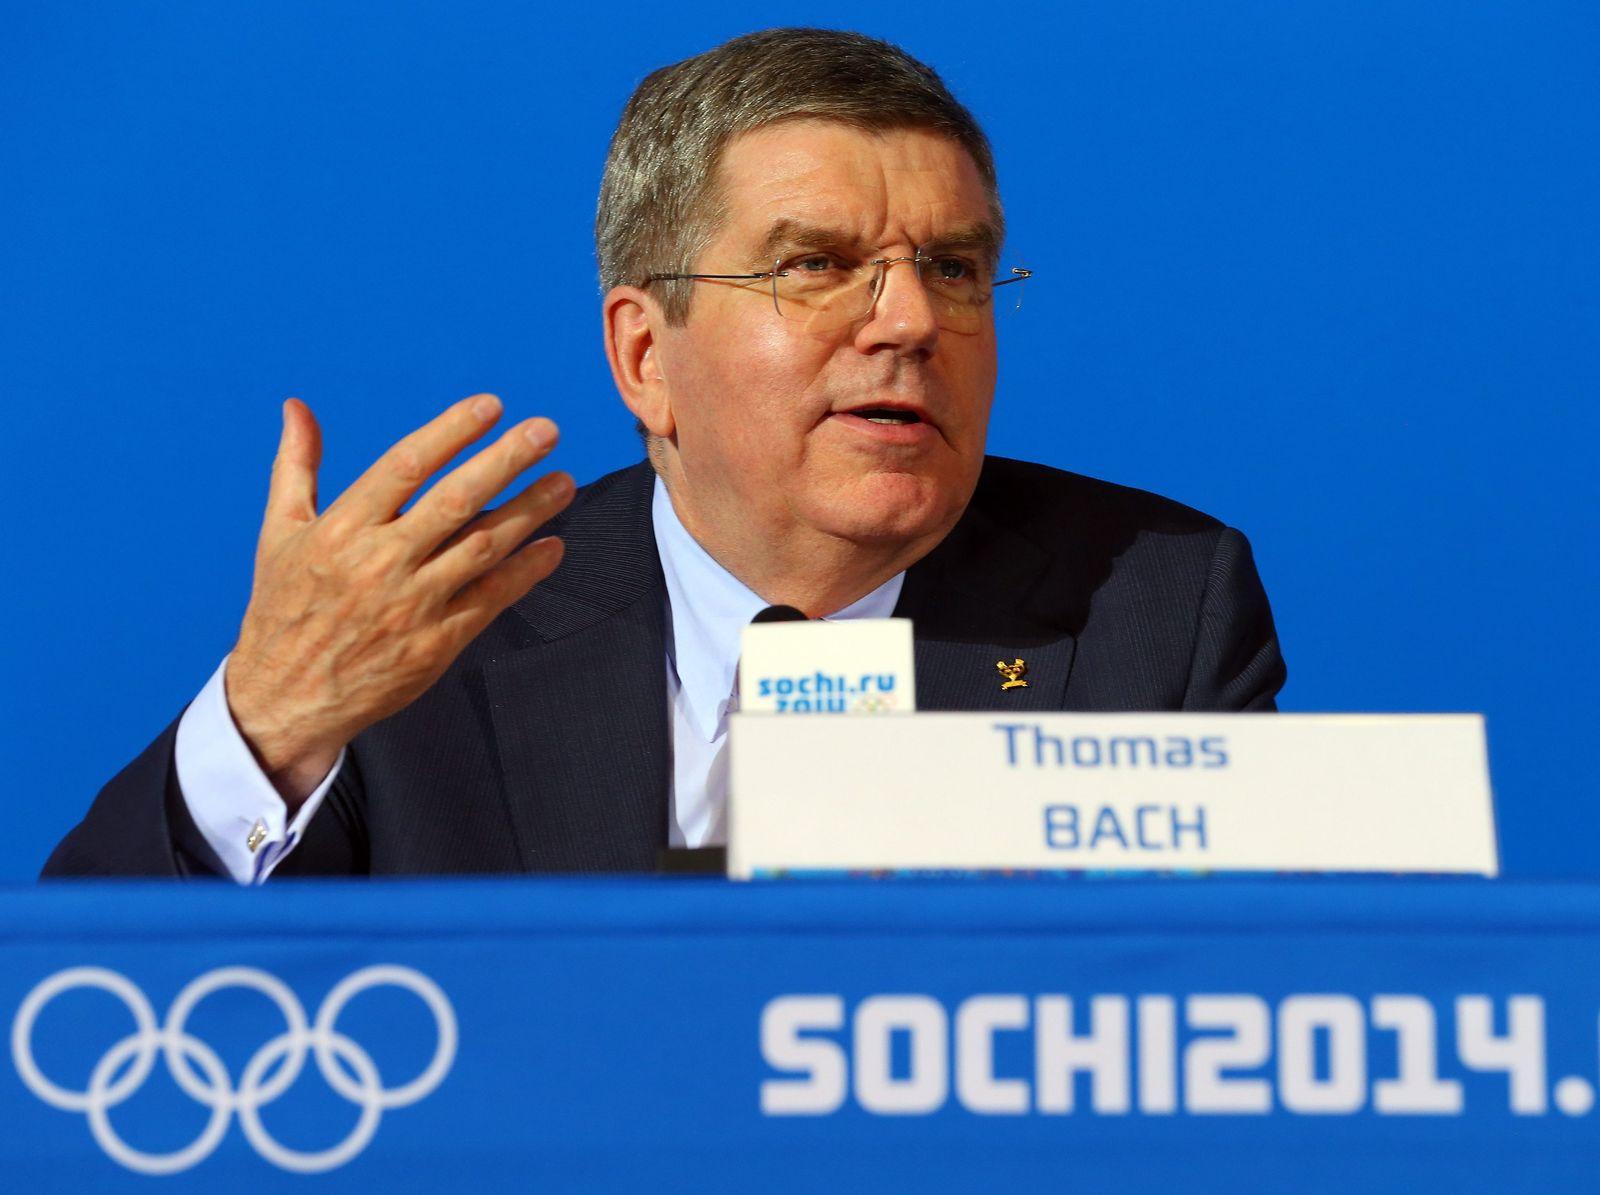 Sotschi 2014 - Pressekonferenz